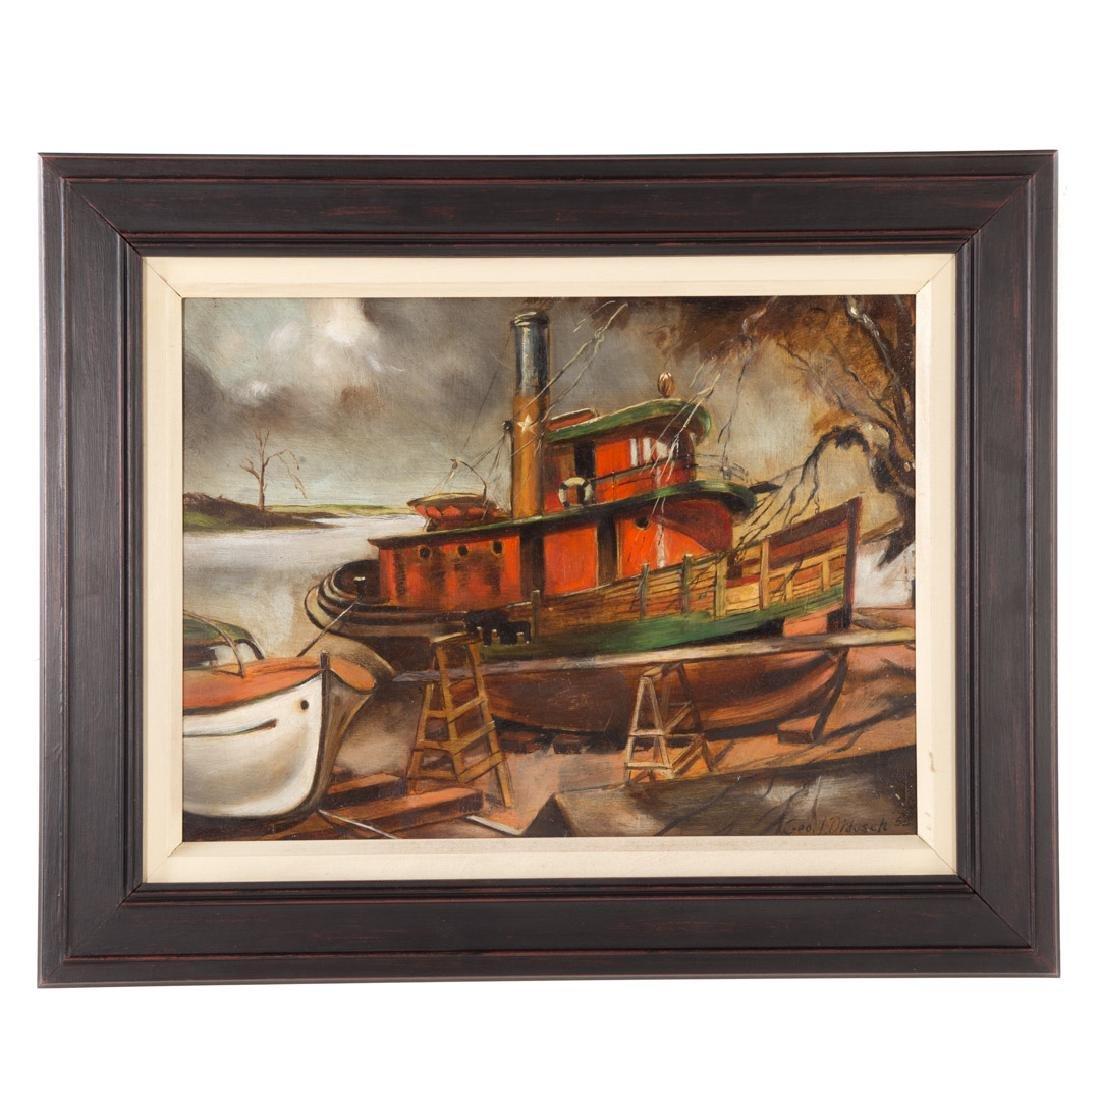 George Didusch. Tugboat in Drydock, oil